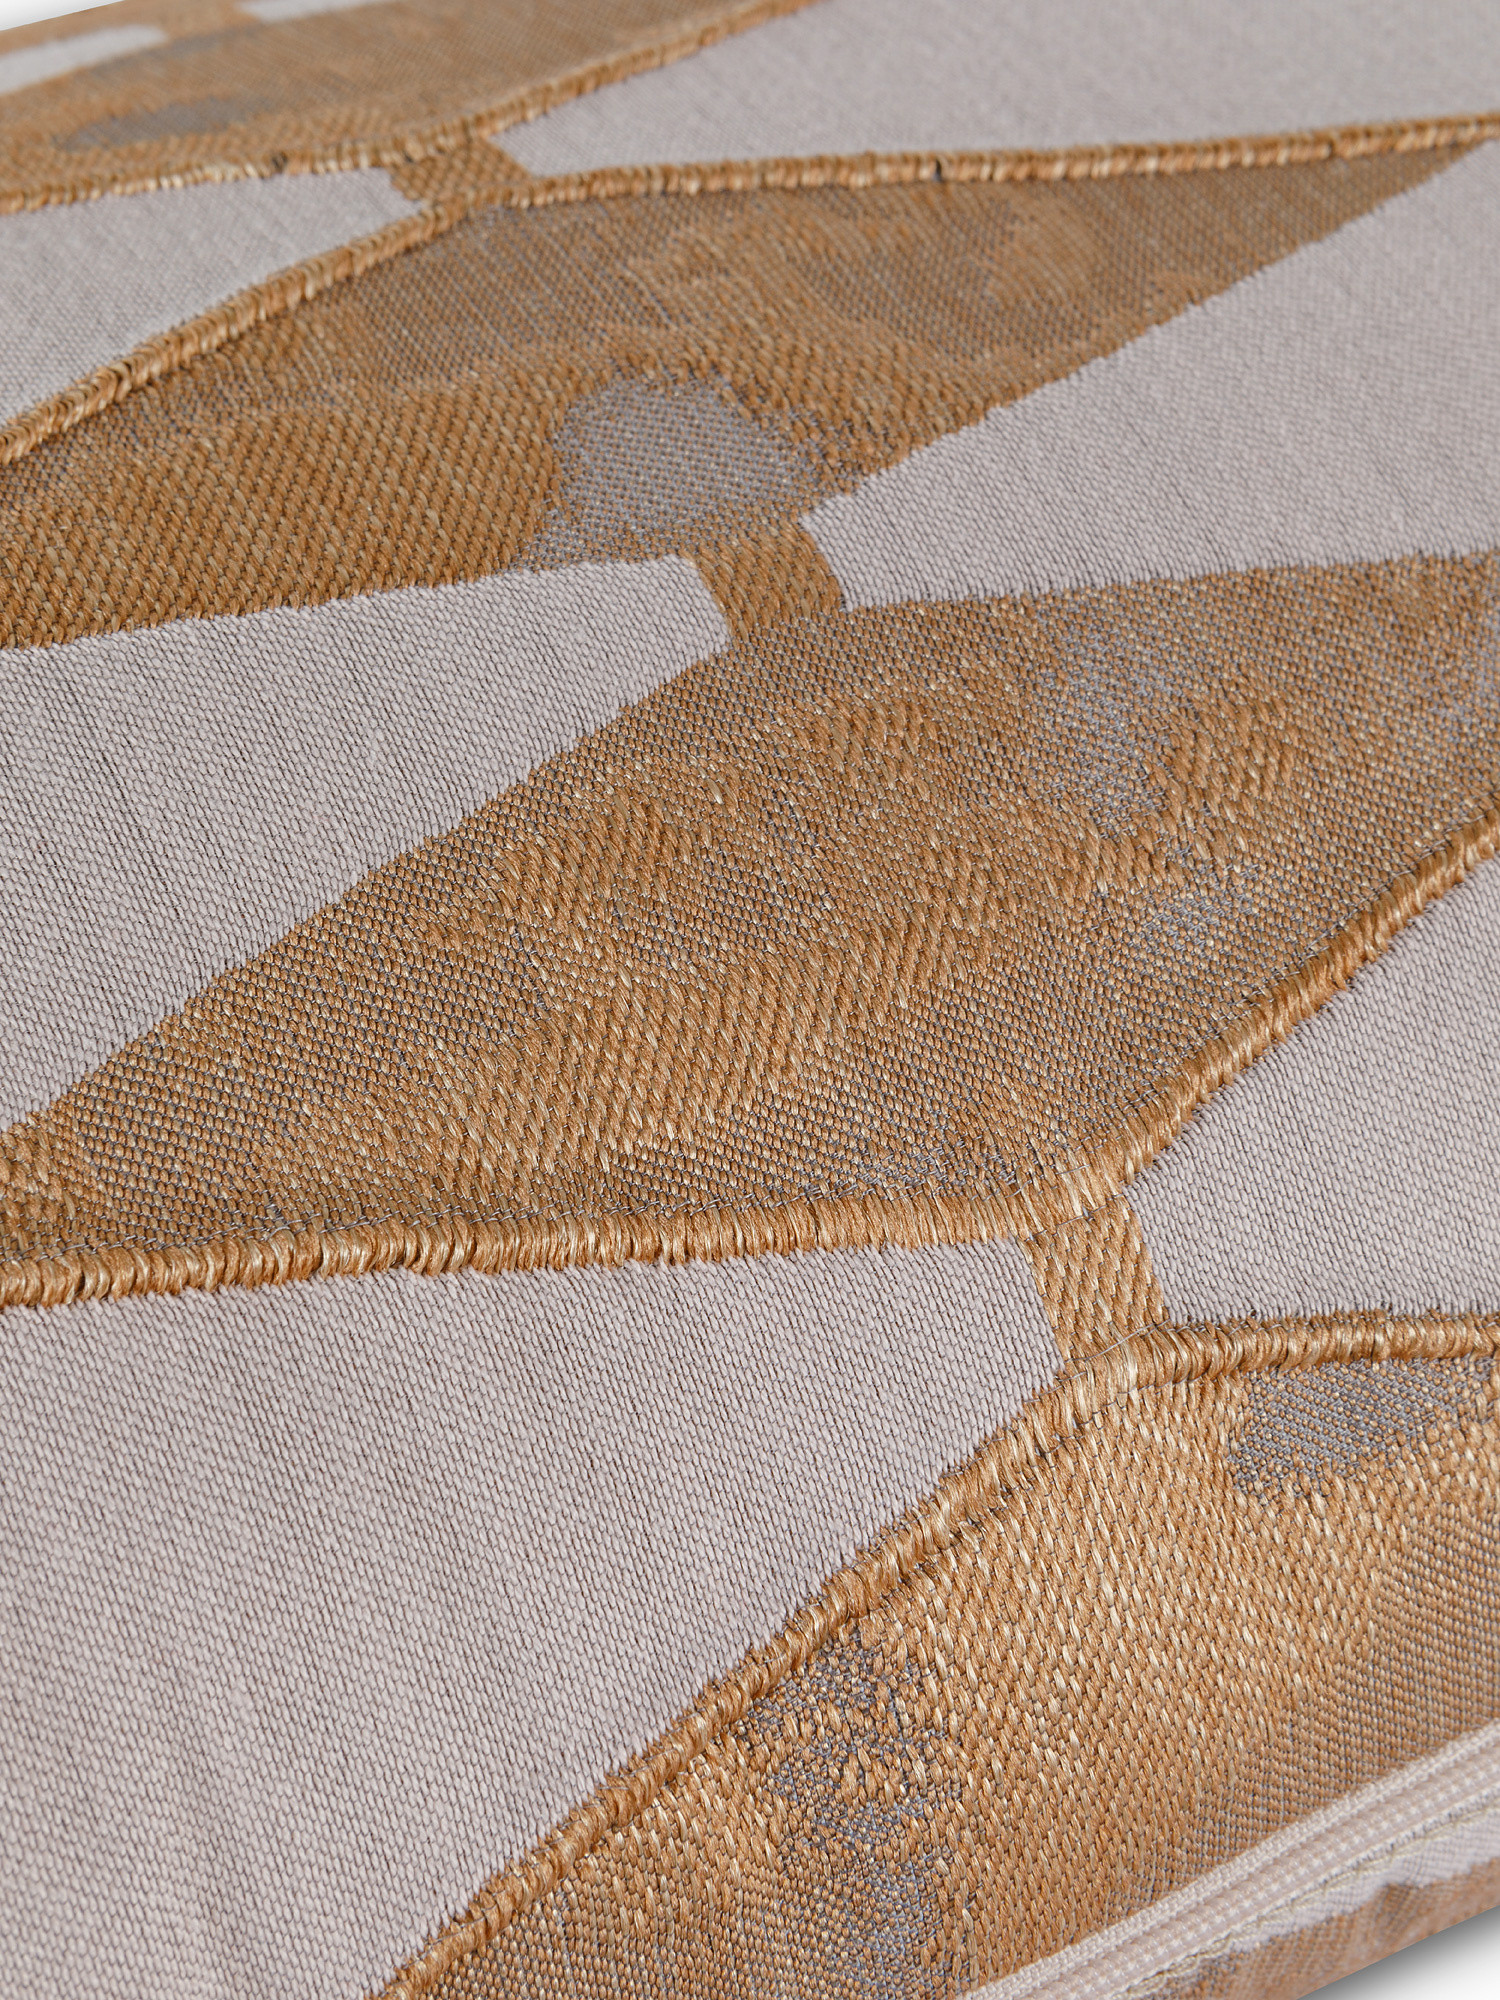 Cuscino tessuto jacquard rombi 35x55cm, Multicolor, large image number 2